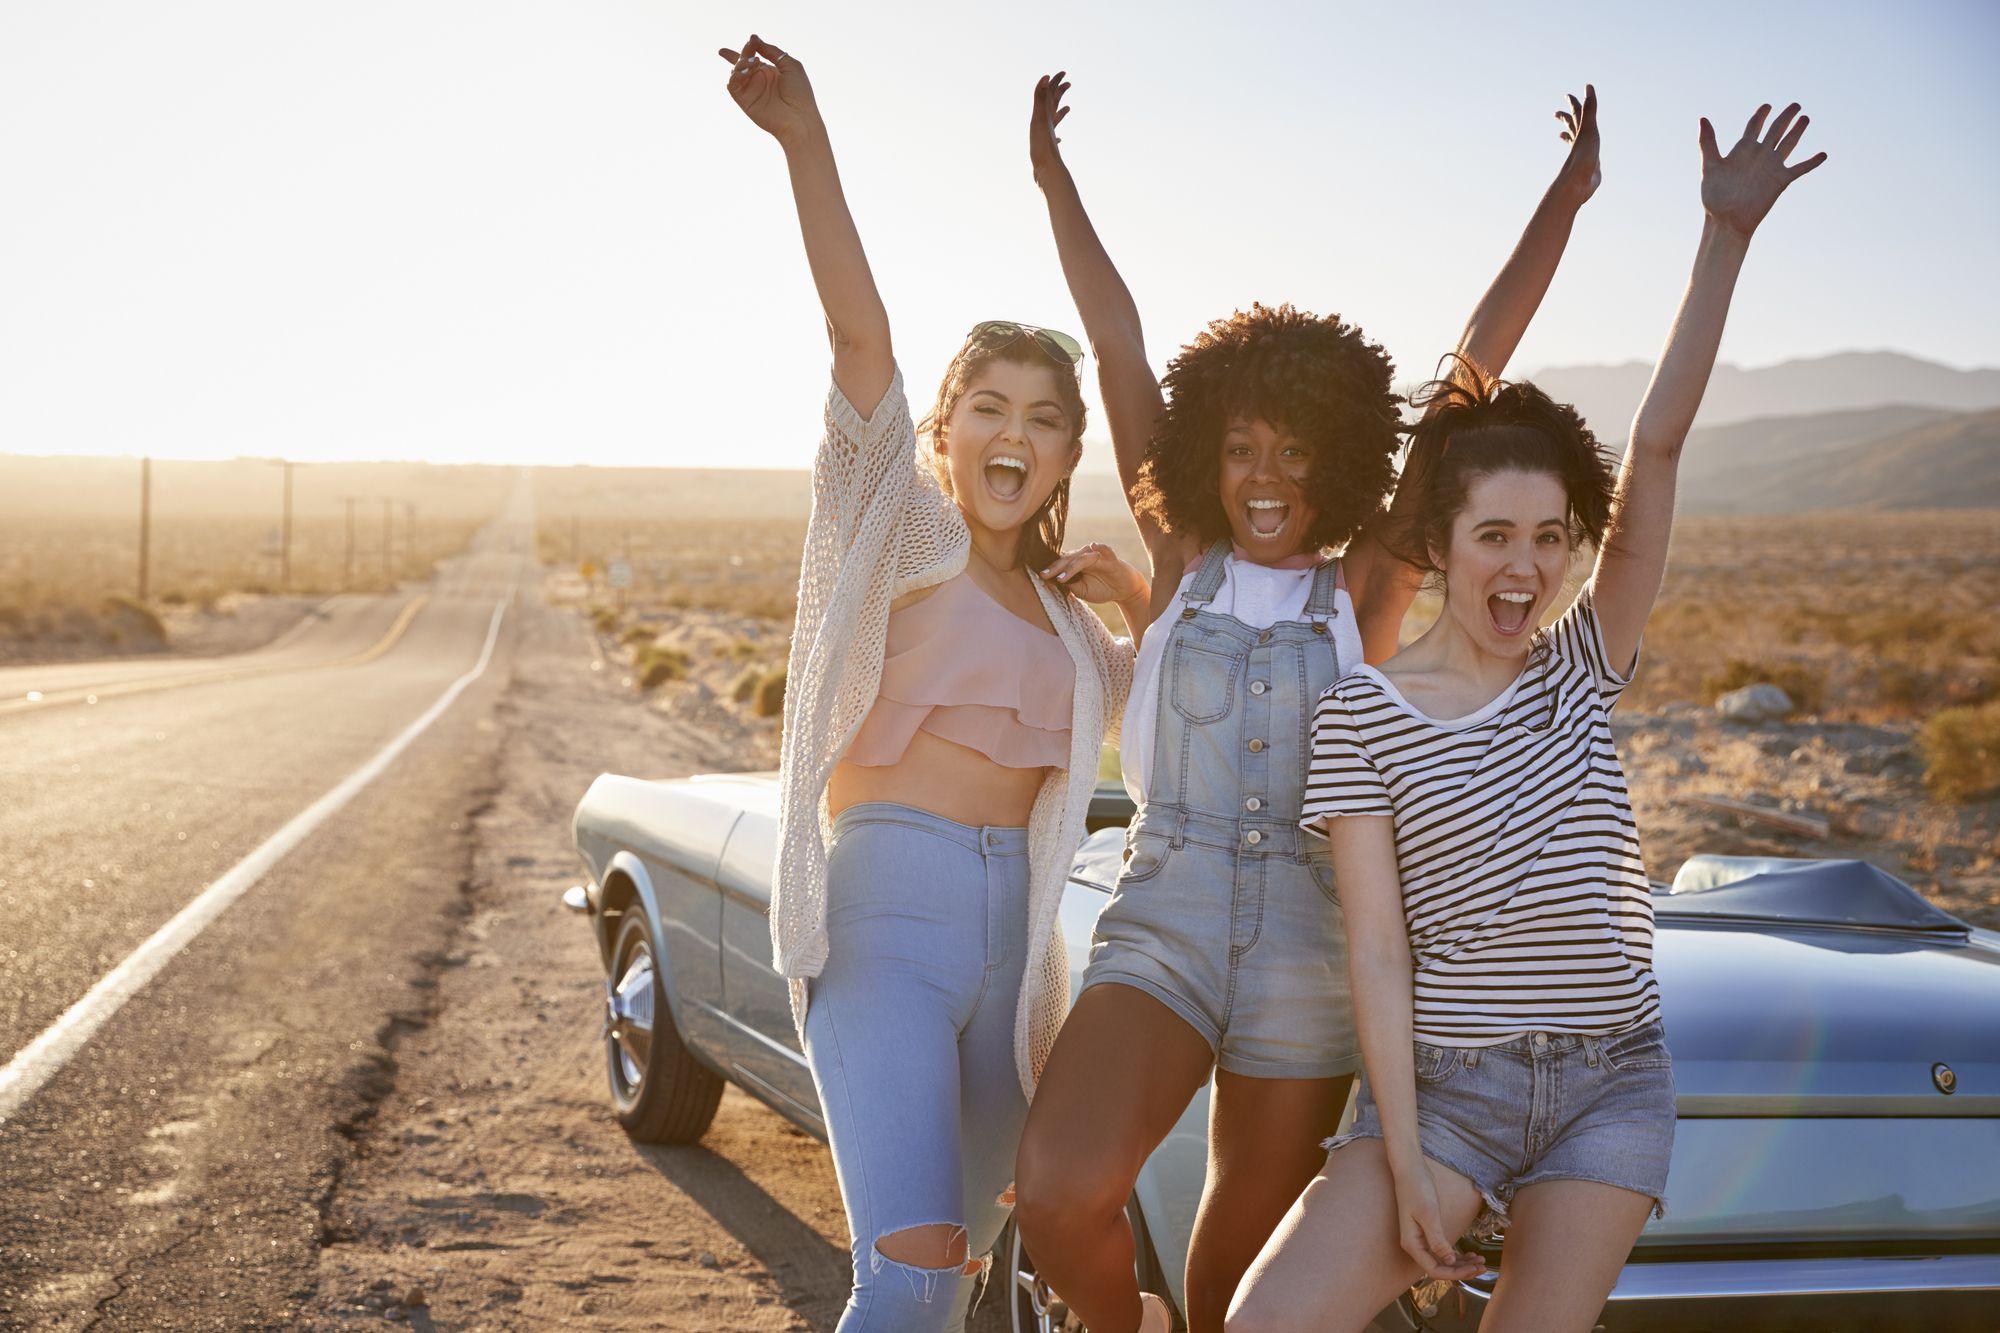 Portrait Of Female Friends Enjoying Road Trip